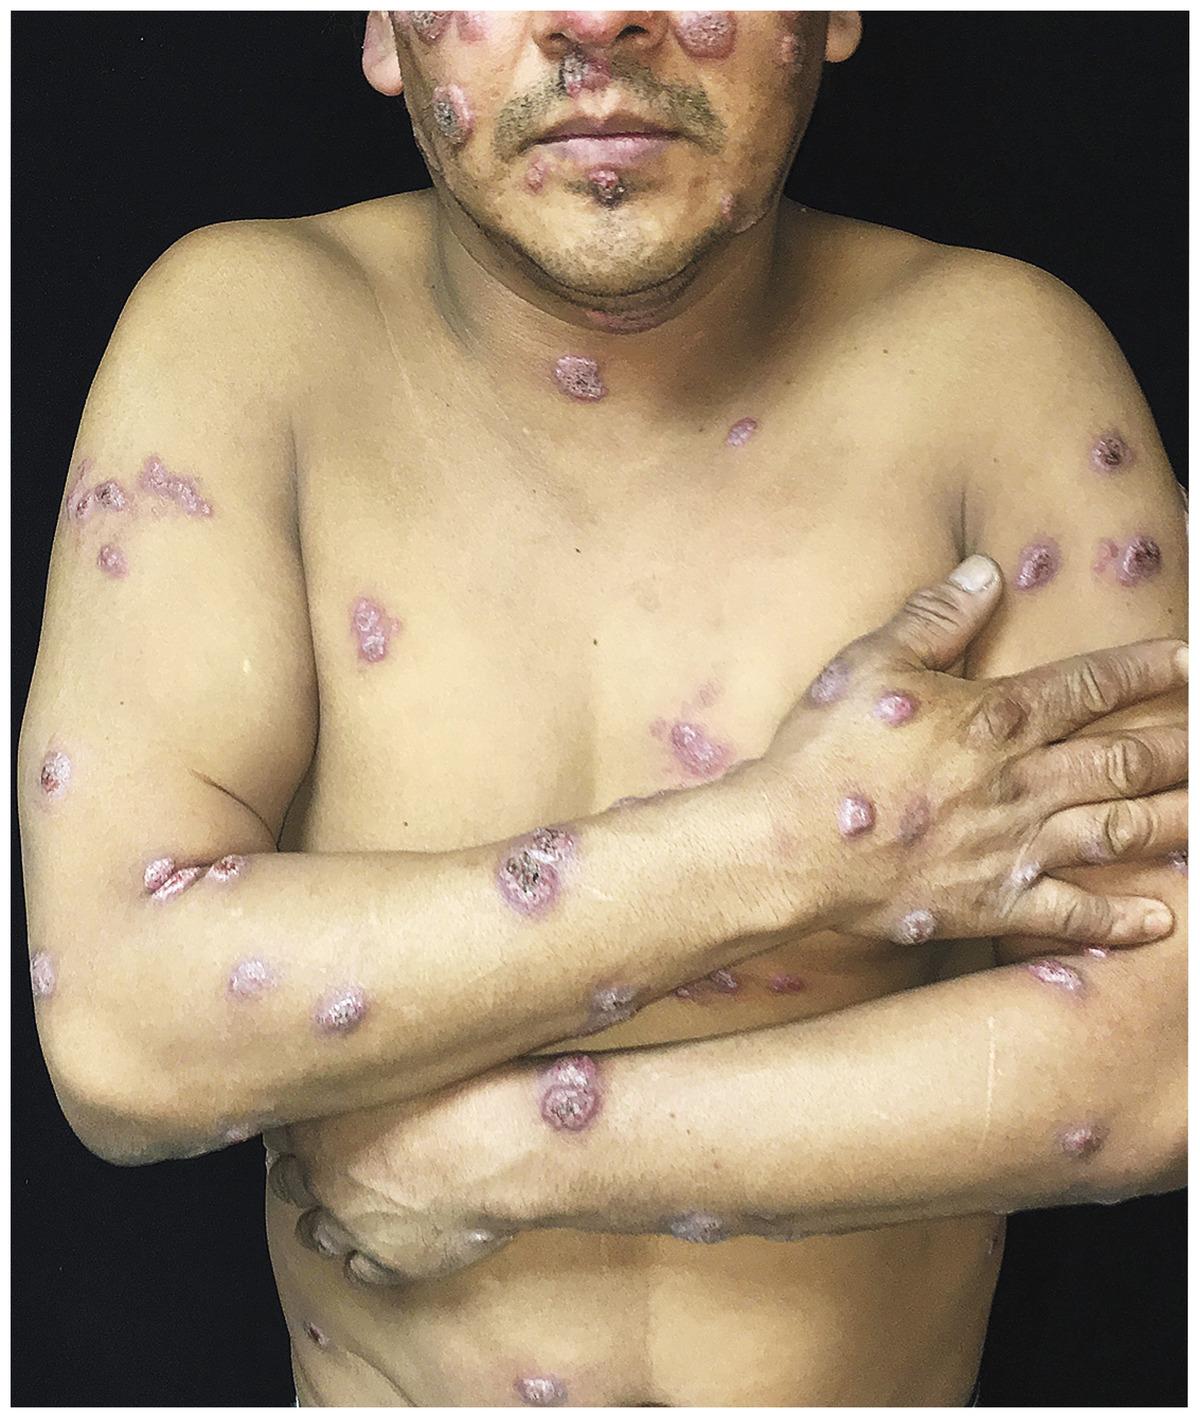 Blastomycosis Skin Lesions